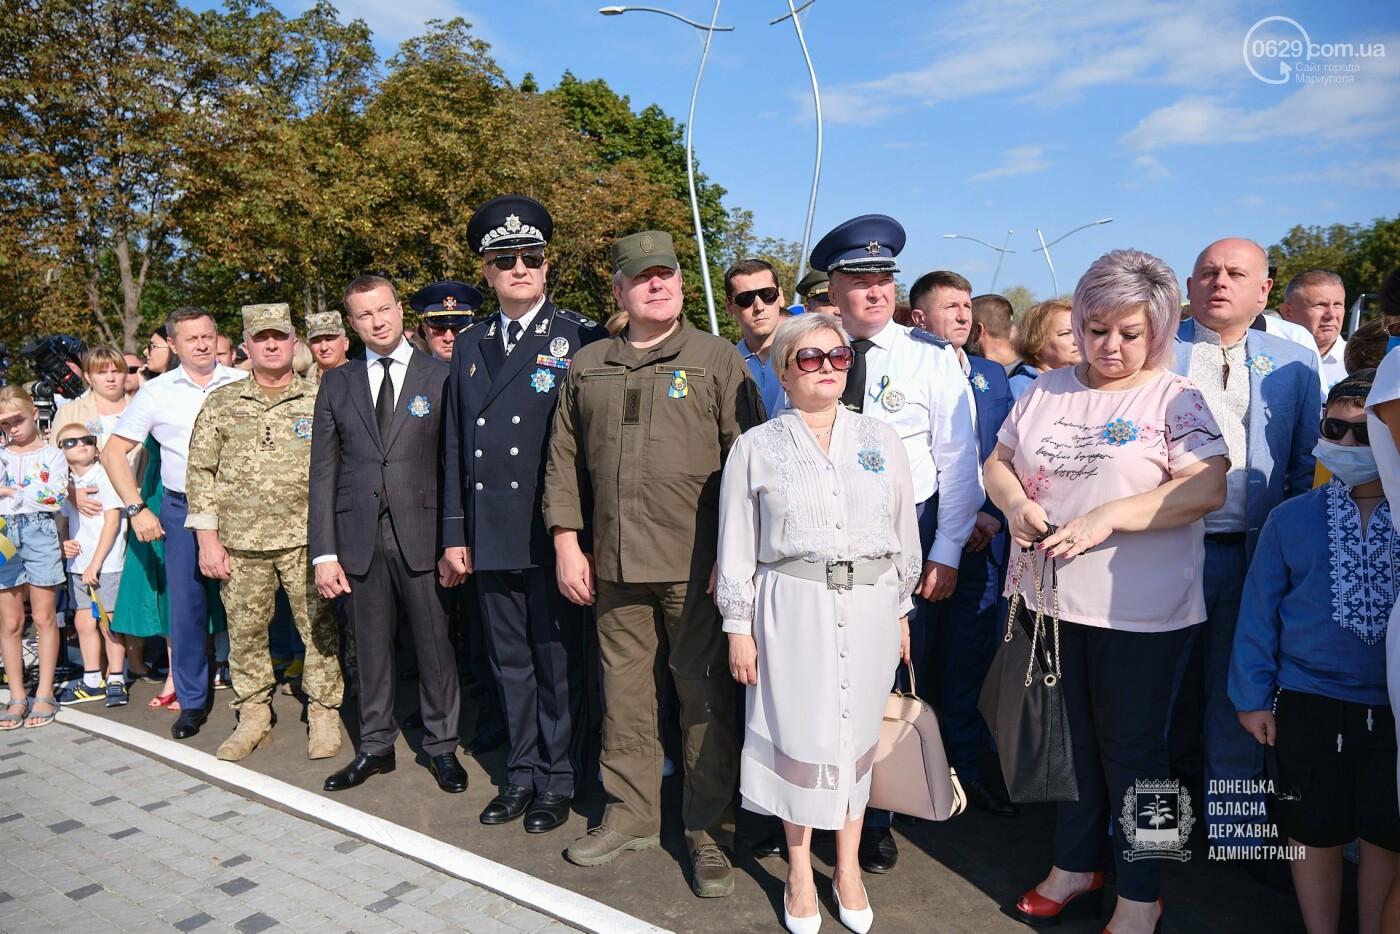 В Донецкой области подняли флаг Украины на 80 метров, - ФОТО, фото-4